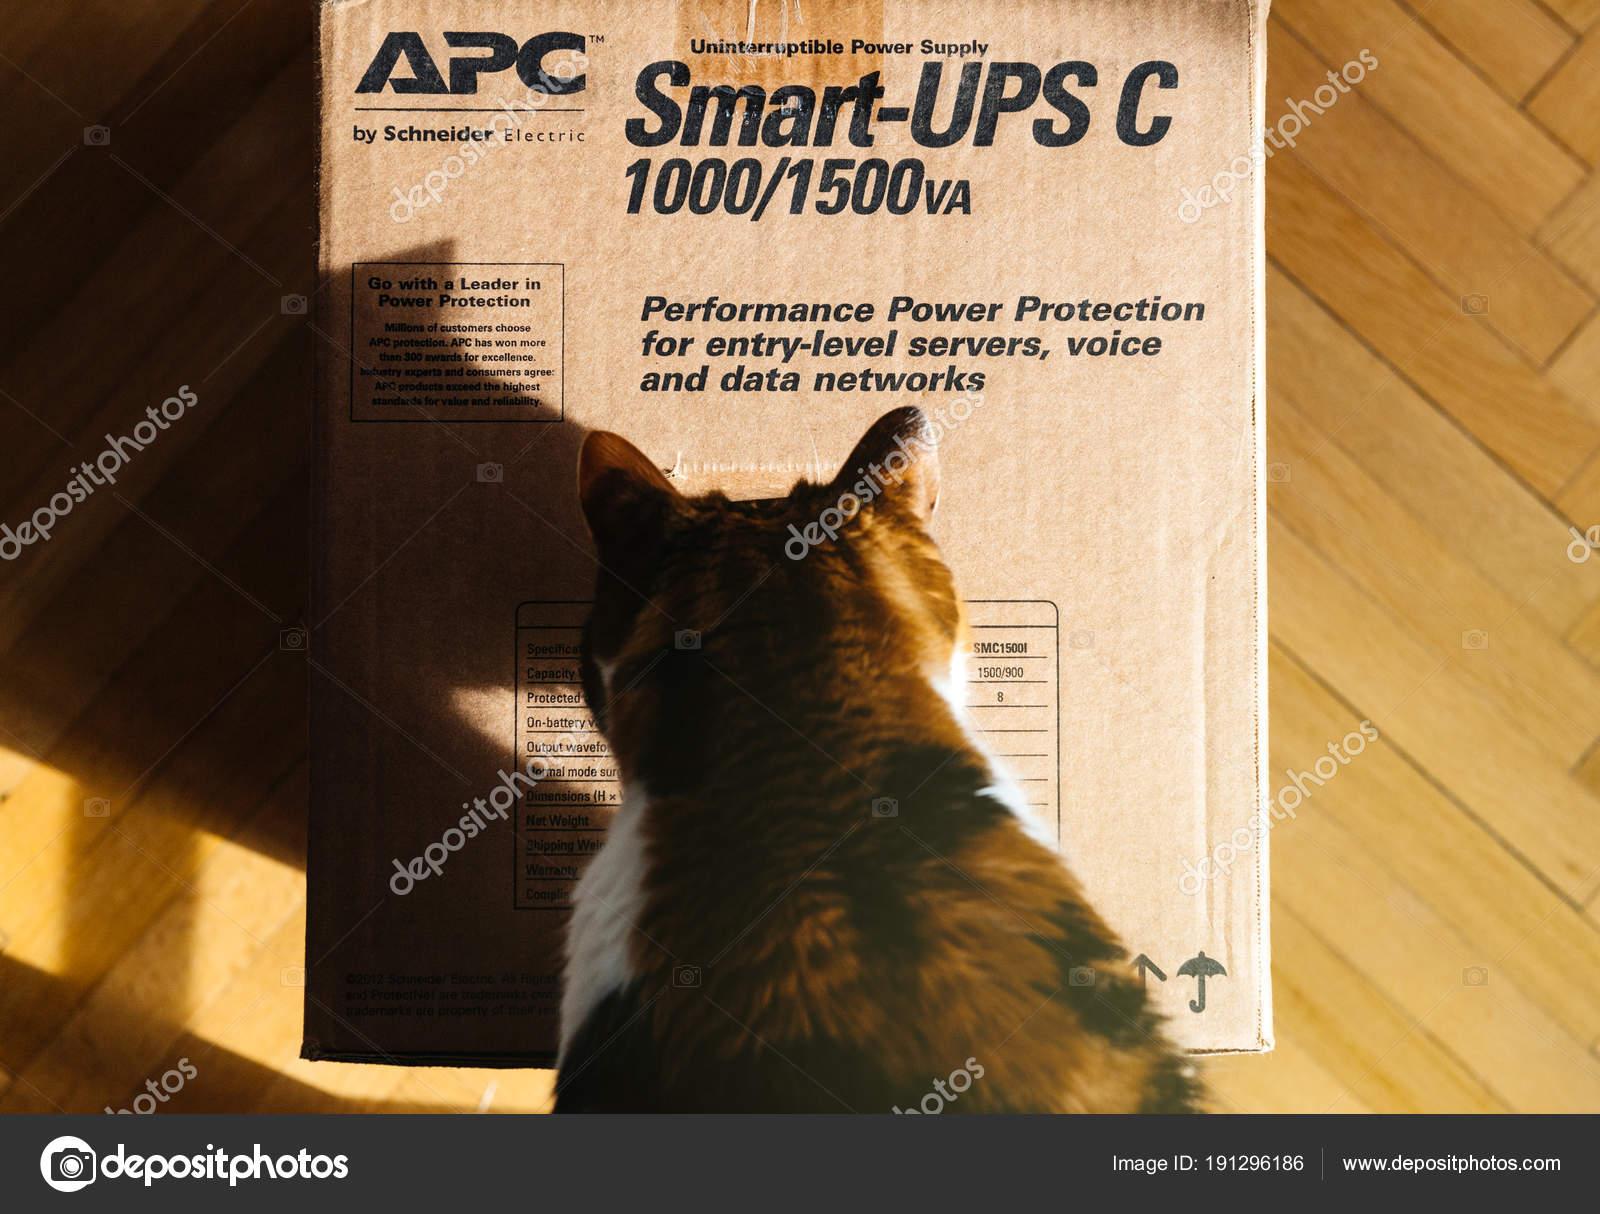 Paris France Mar 2018 Curious Cat Inspecting Apc Smart Ups